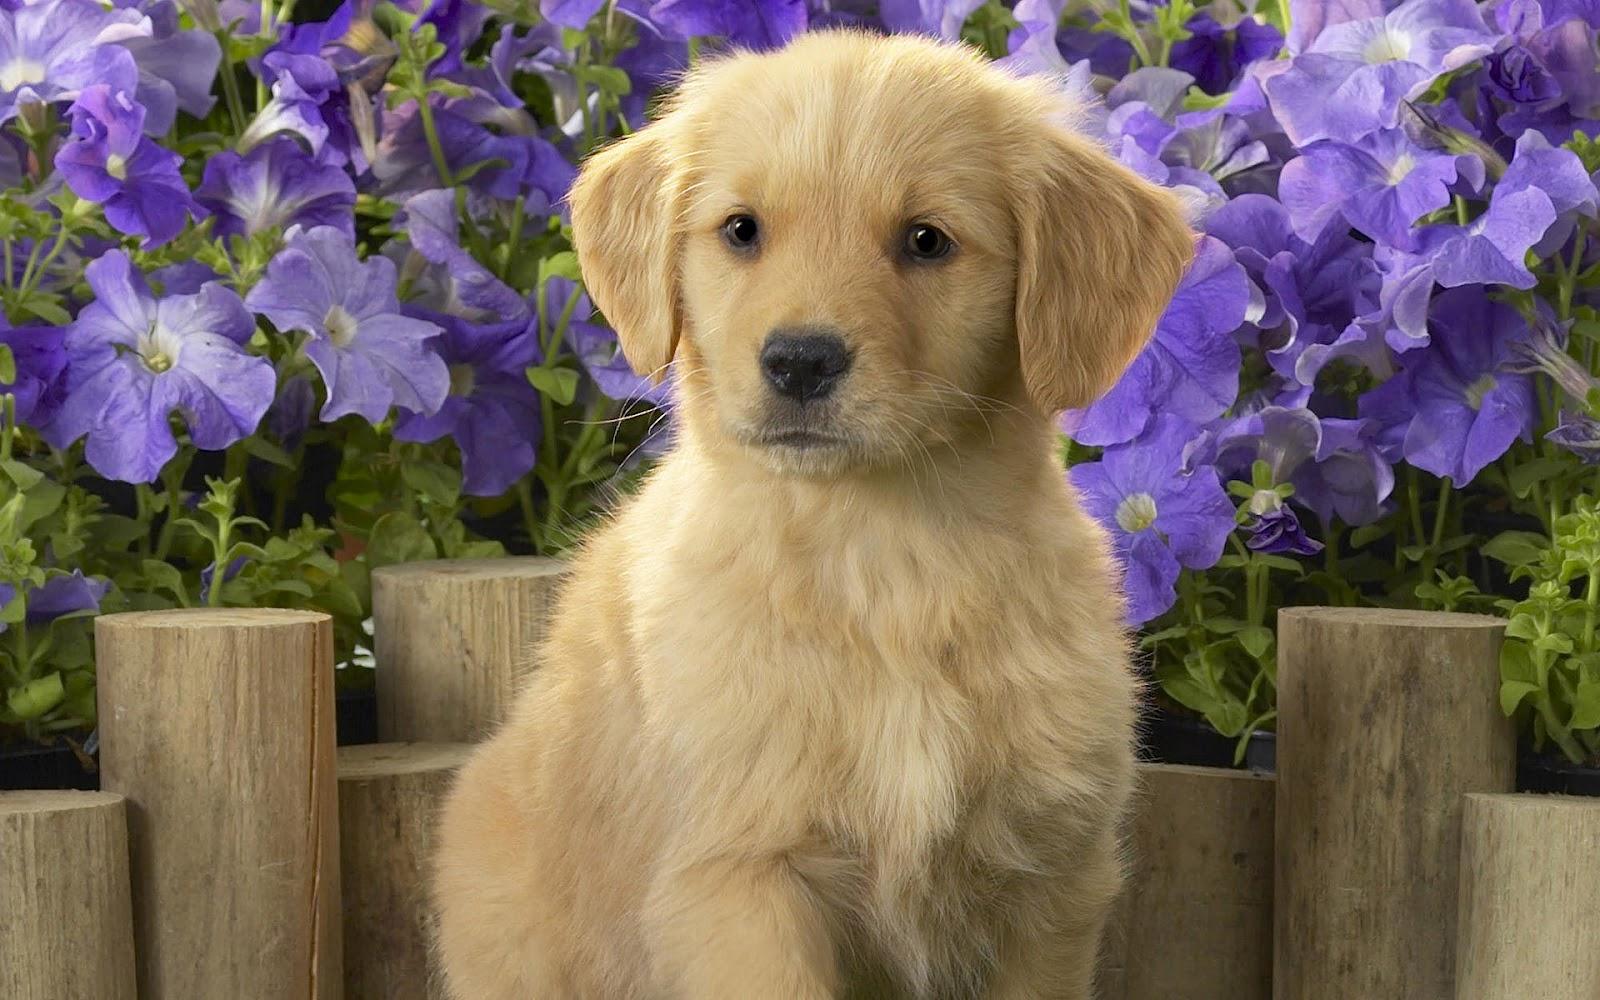 Cute Dogs Wallpapers Dog Puppy Desktop Wallpapers Hd 1600x1000